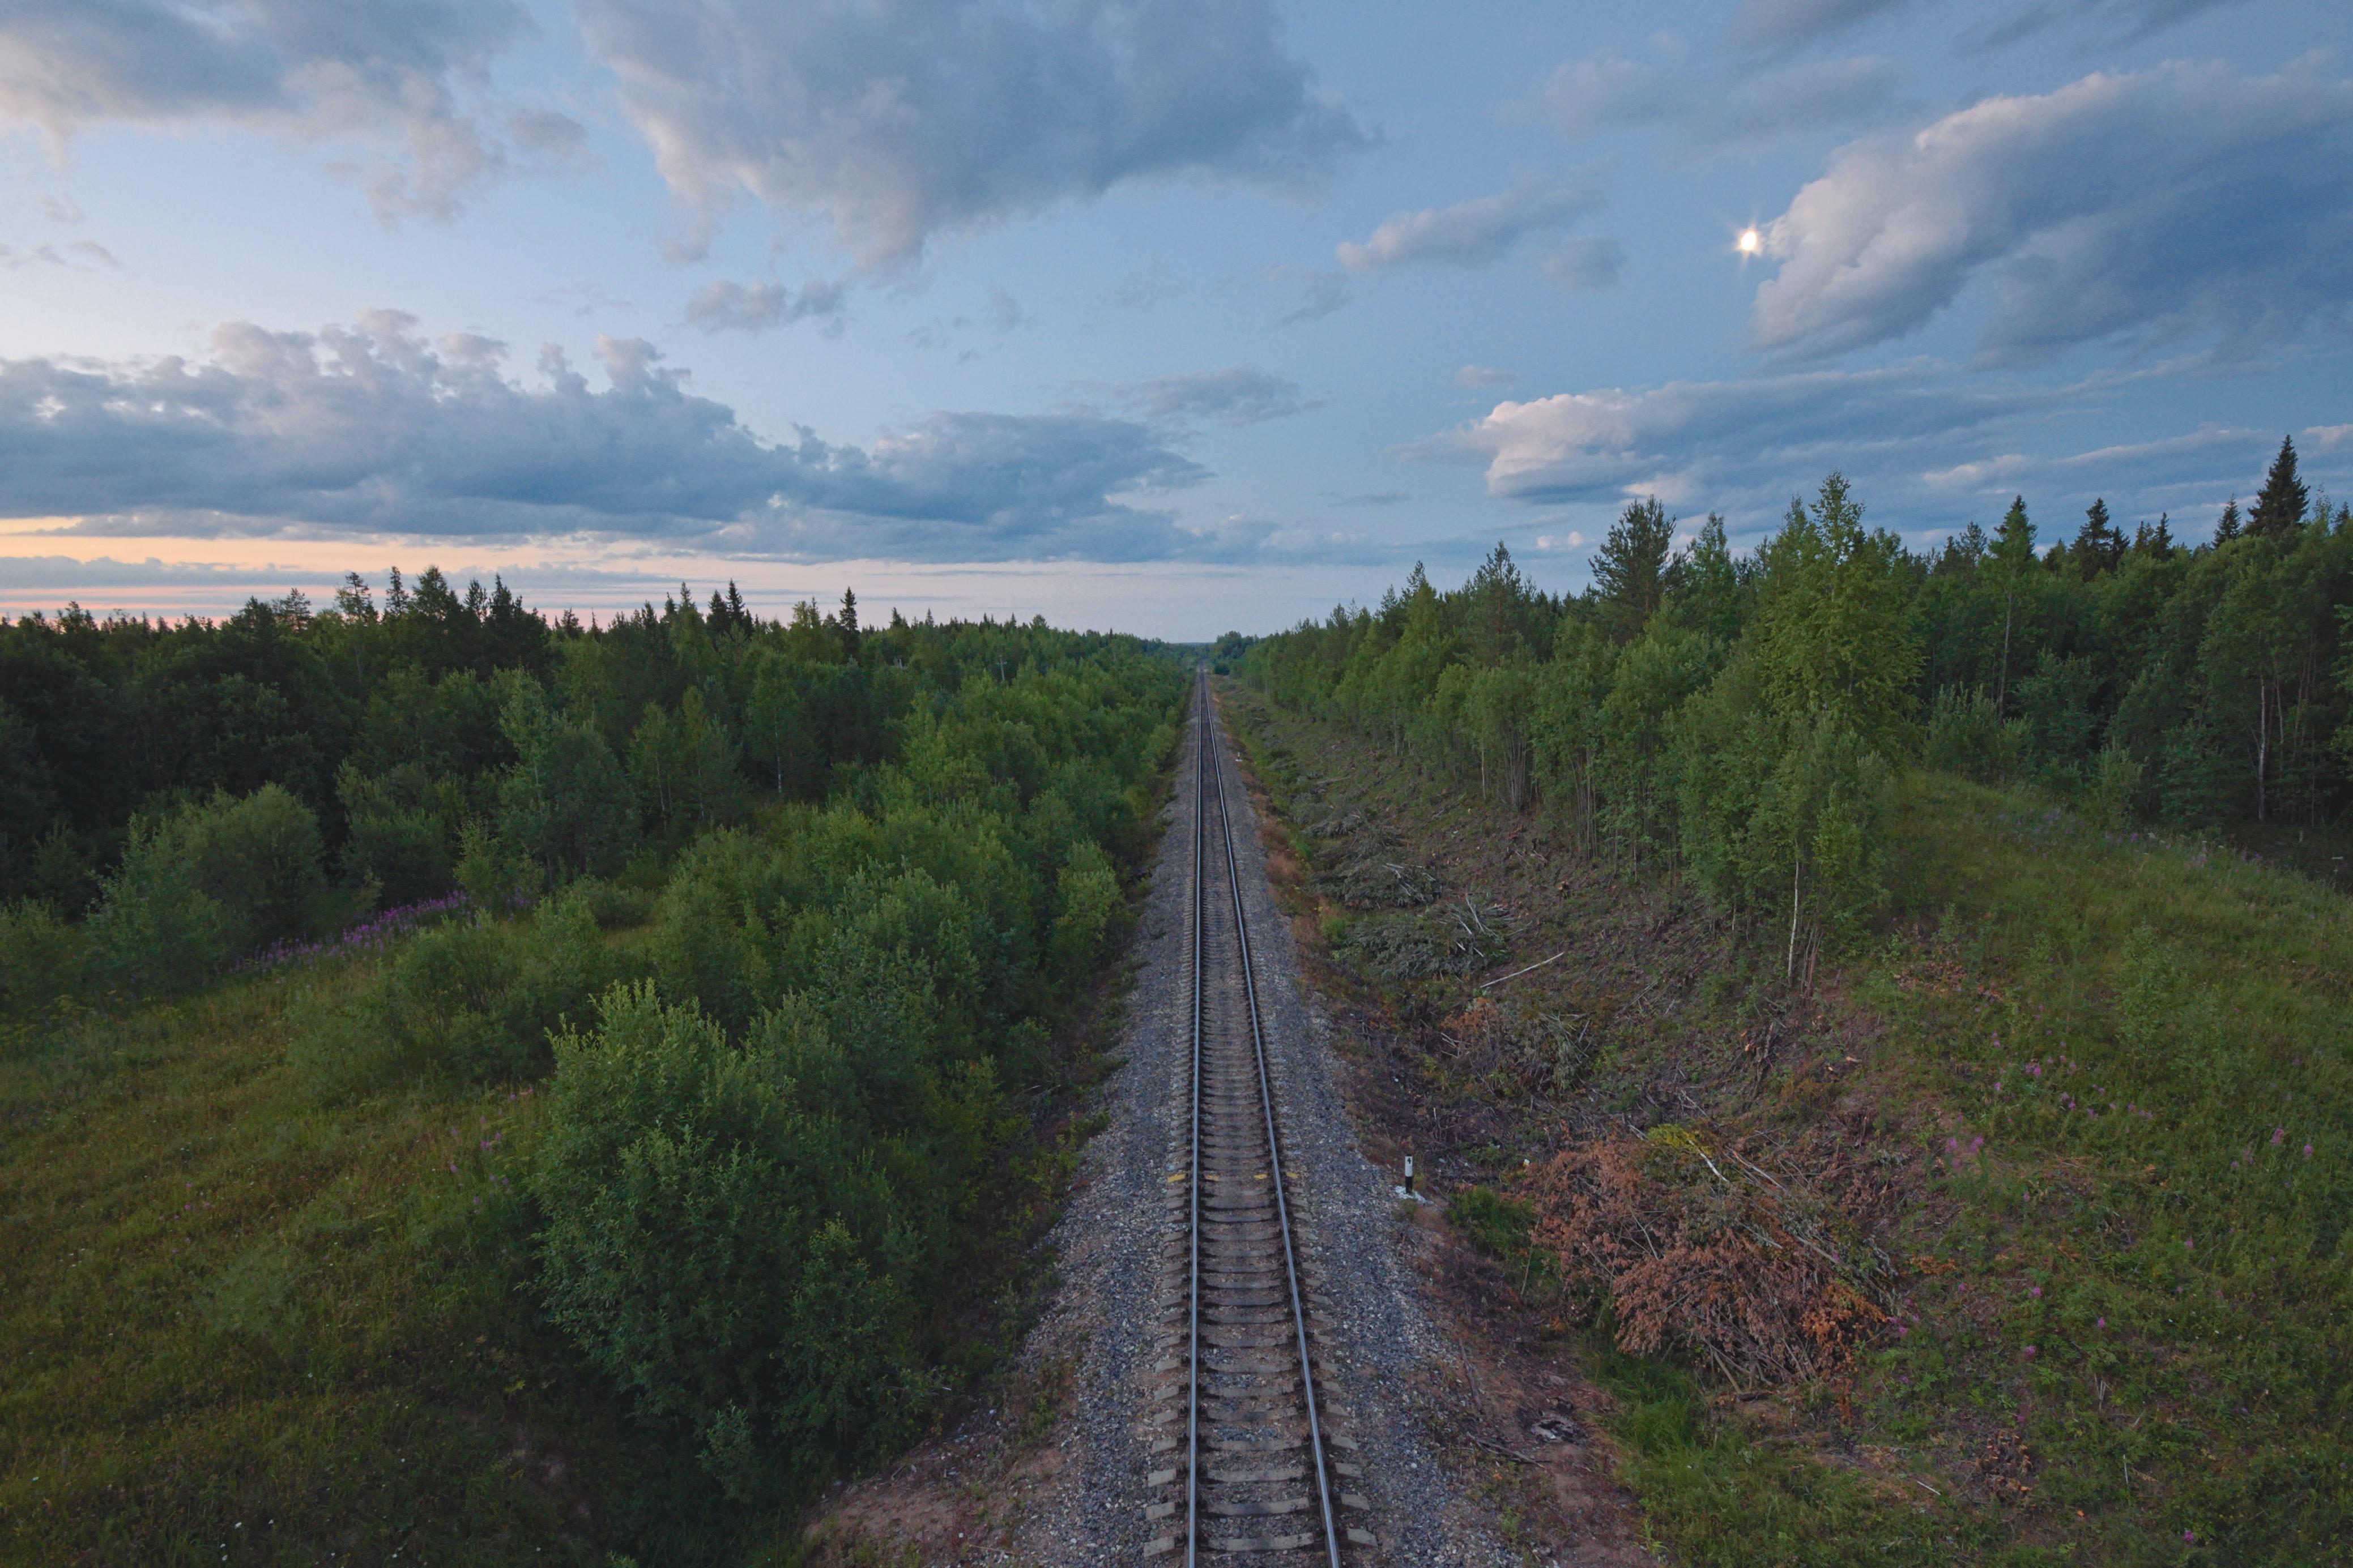 A drone view of a railroad passing through an empty forest in Архангельская область, Россия